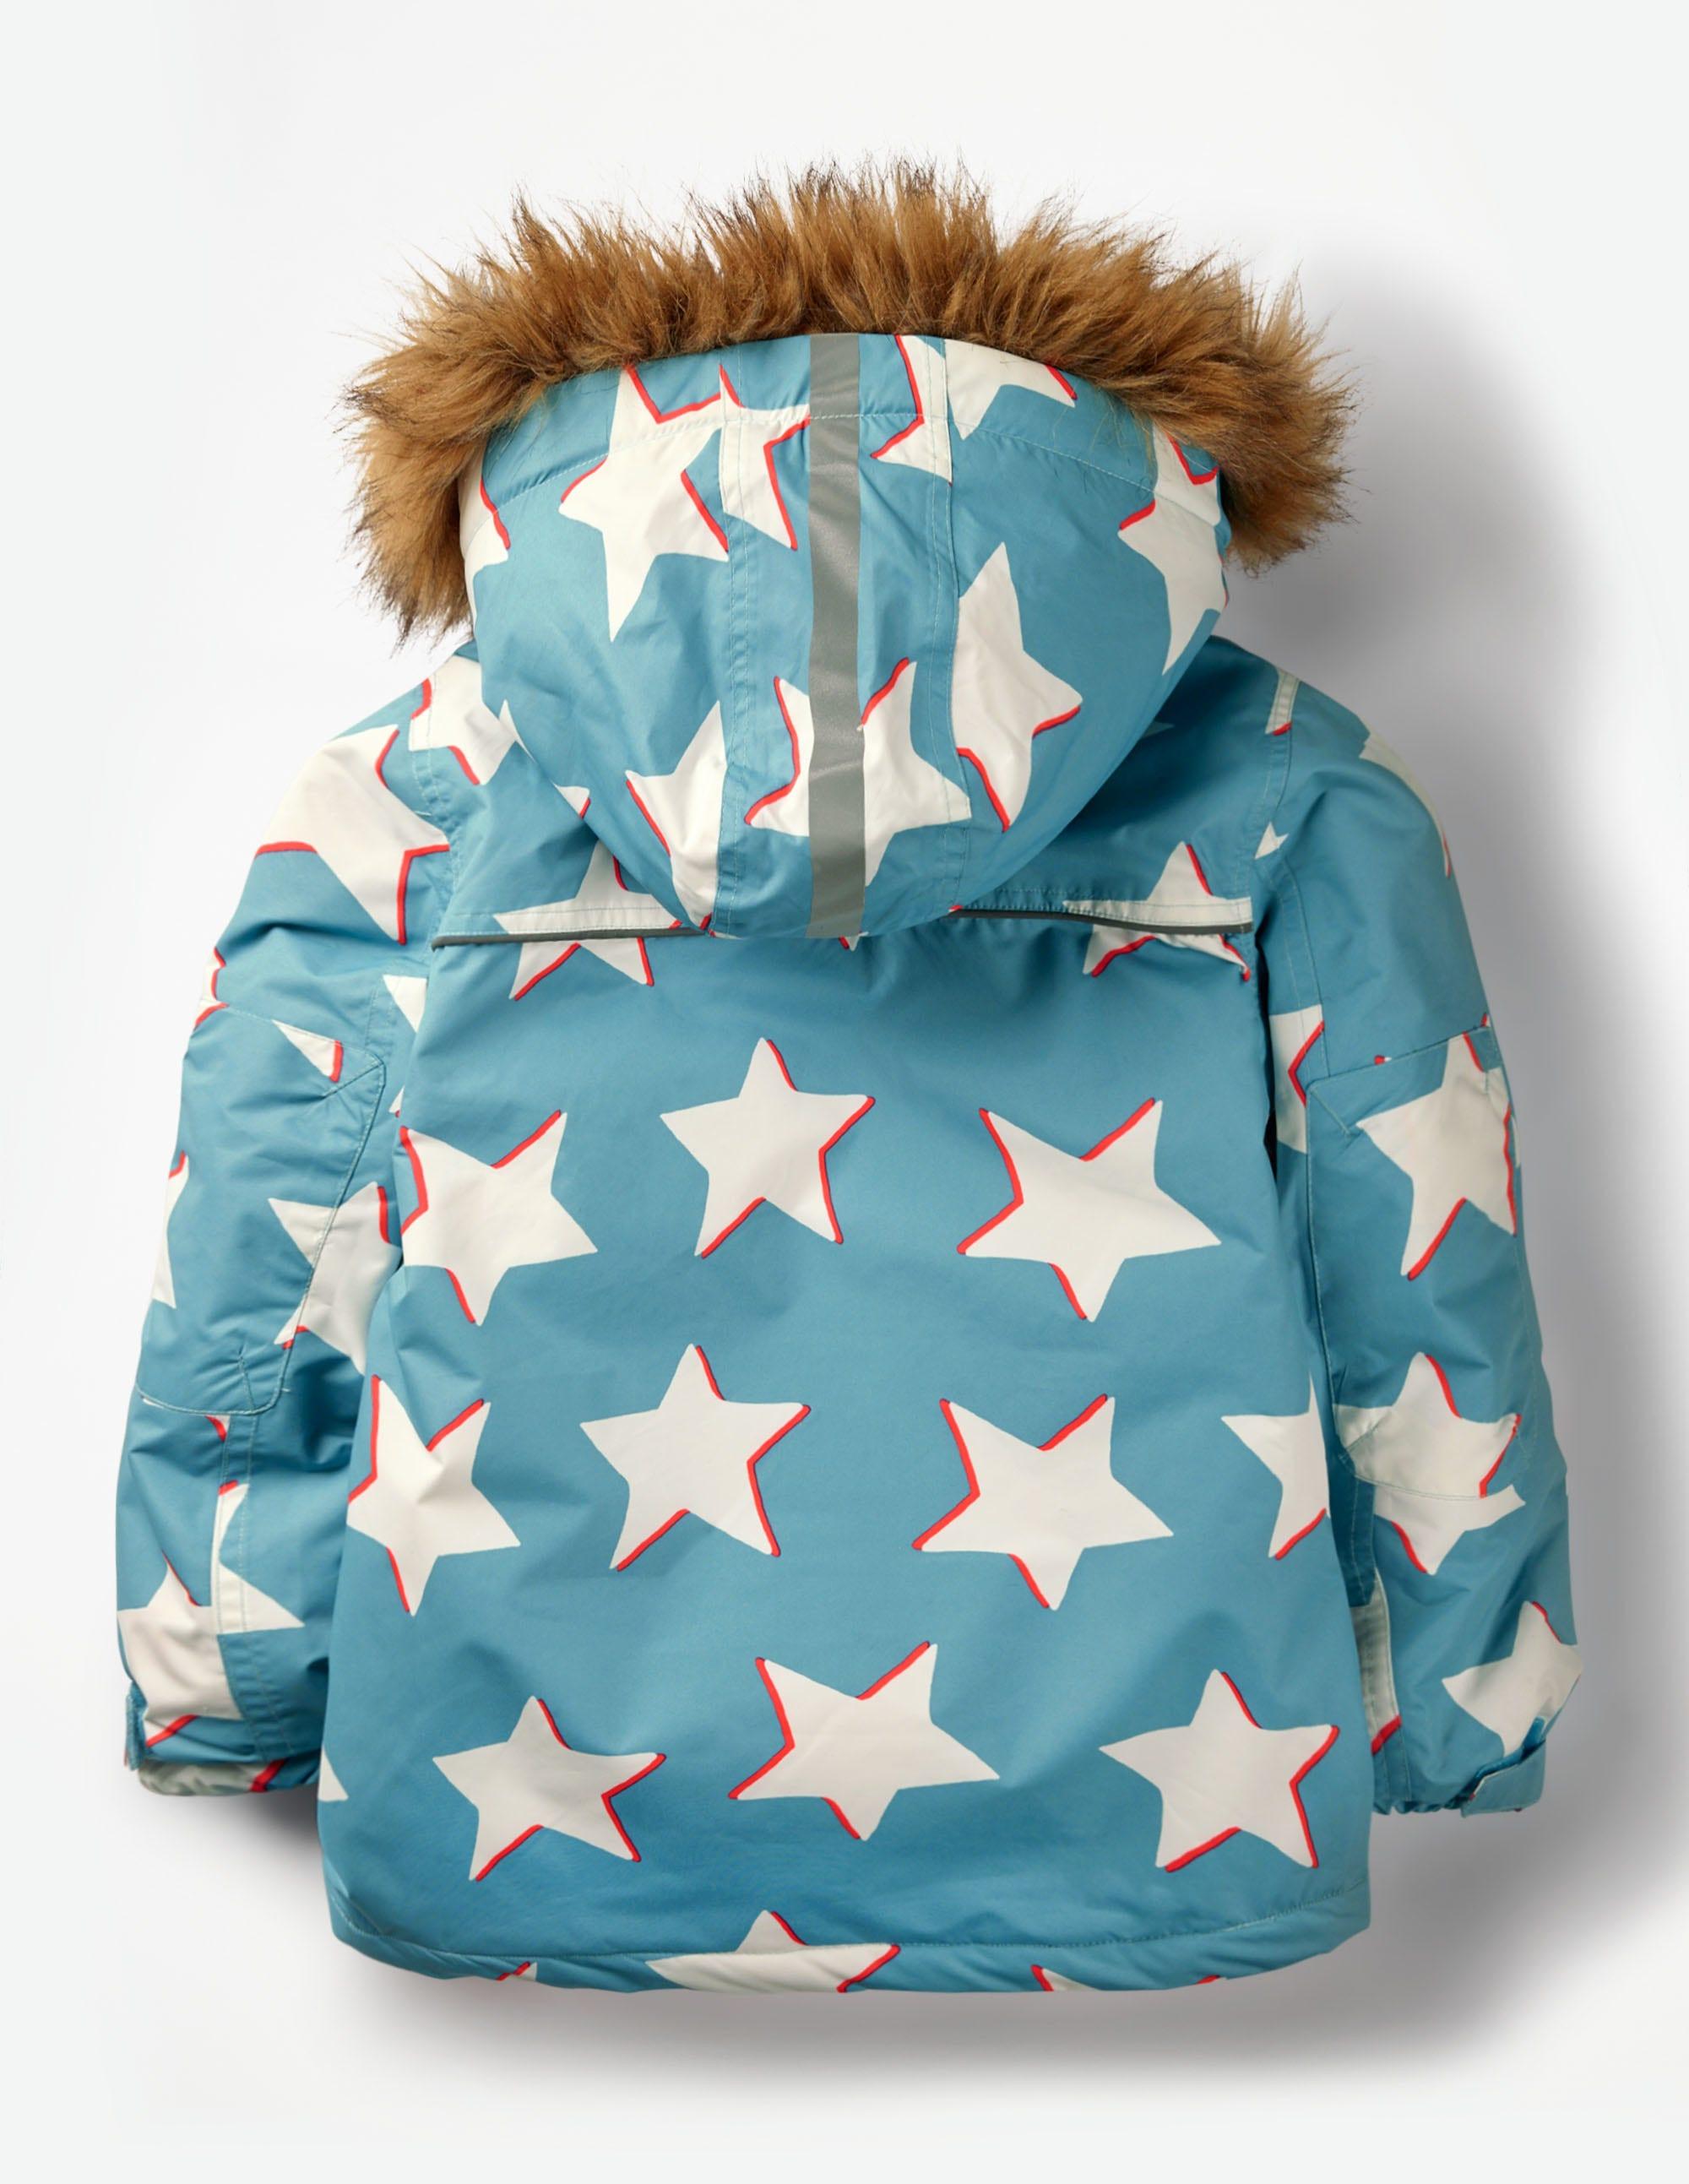 f20a76ff7 All-Weather Waterproof Jacket - Delphinium Blue Shadow Stars ...